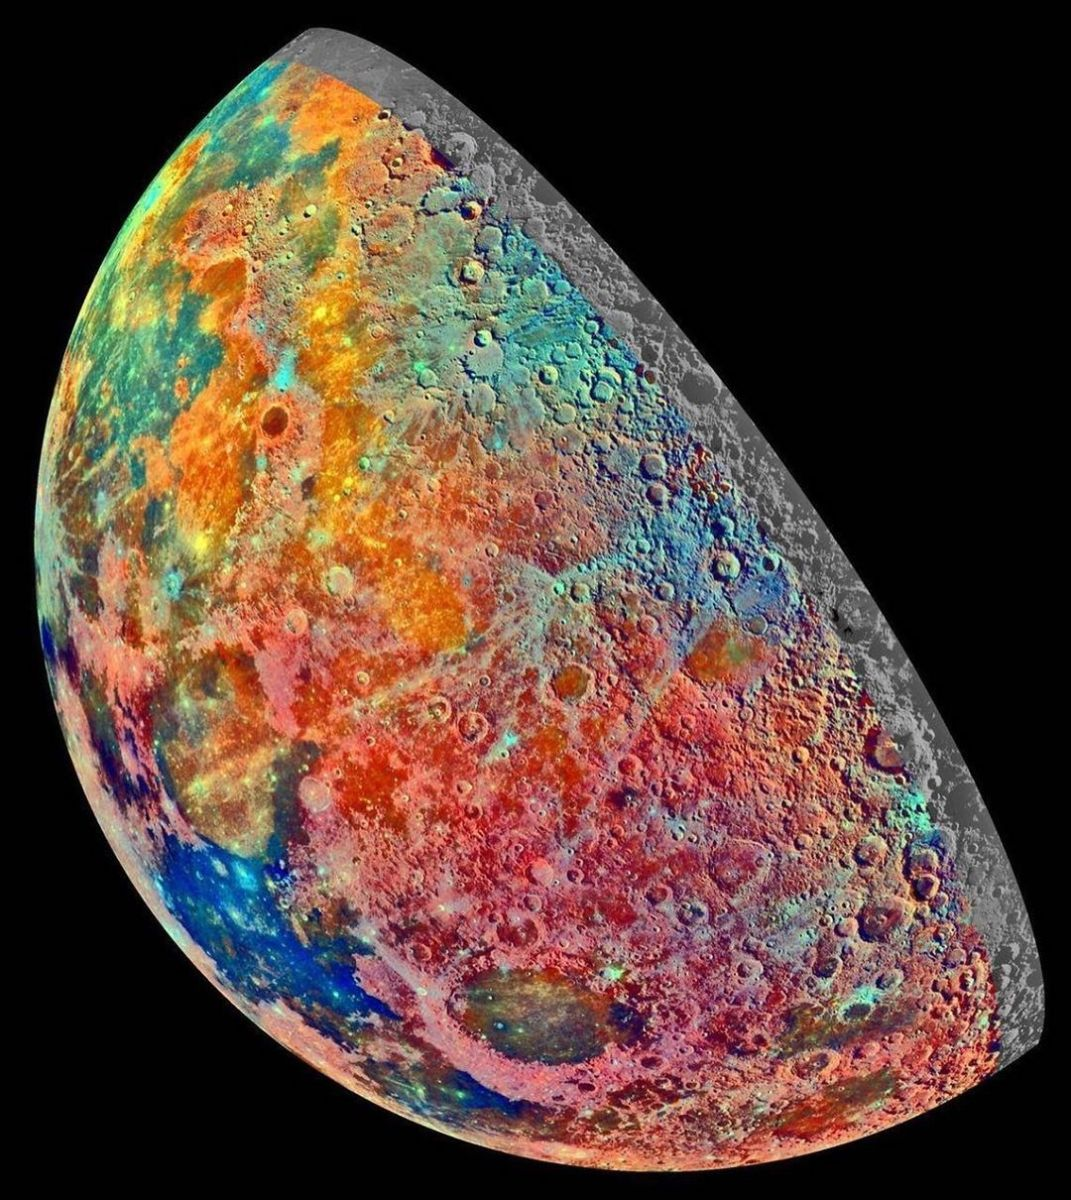 Galileo spacecraft took this false-color mosaic